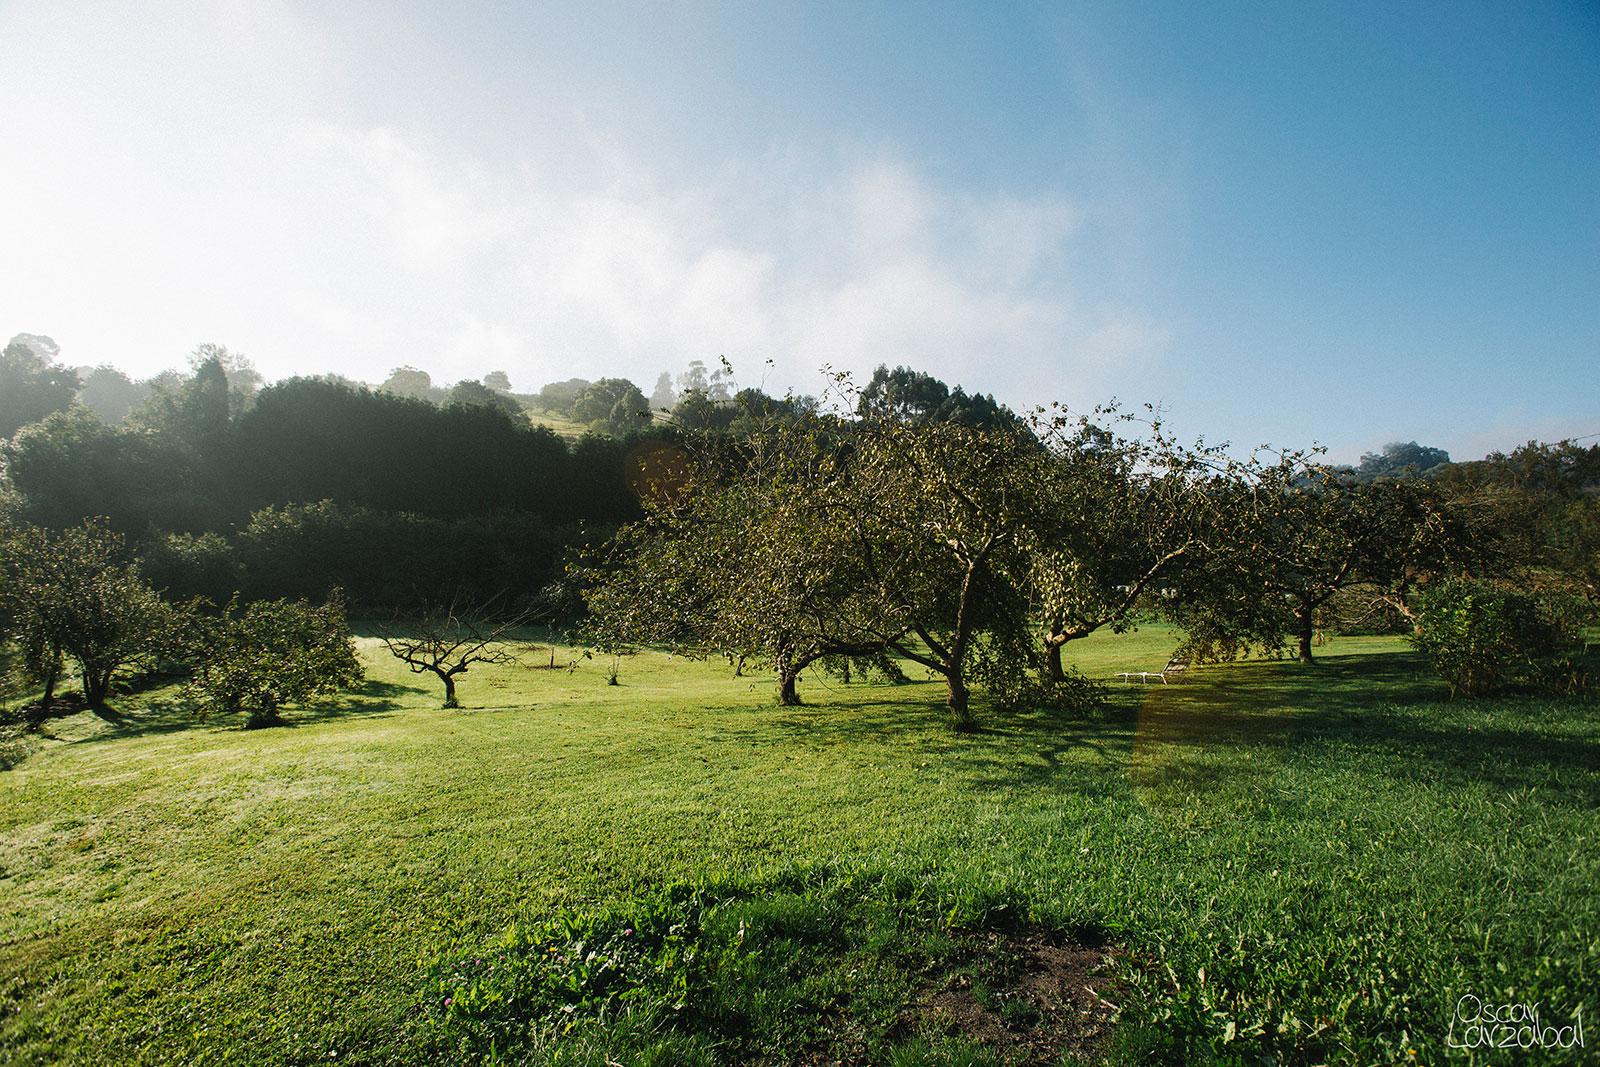 Fotógrafo Asturias, Cantabria, Santander, Ribamontán Al Mar, Galizano, Carriazo, Castanedo